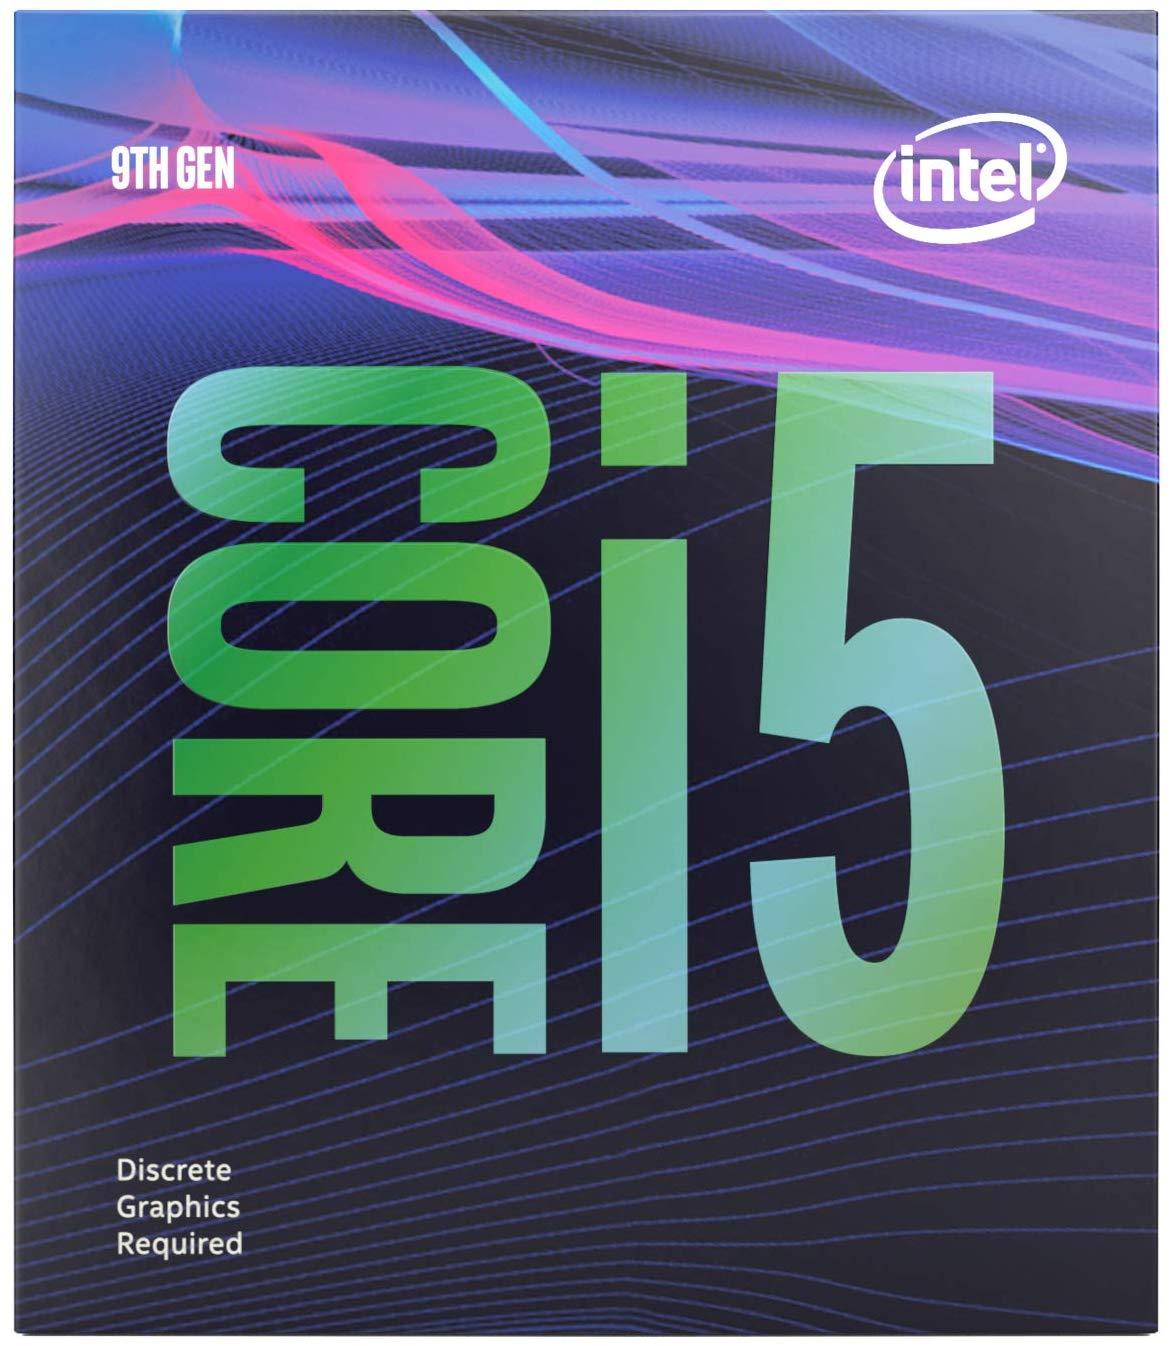 Intel i5-9400F SKT1151 Processor £166.70 @ Amazon UK